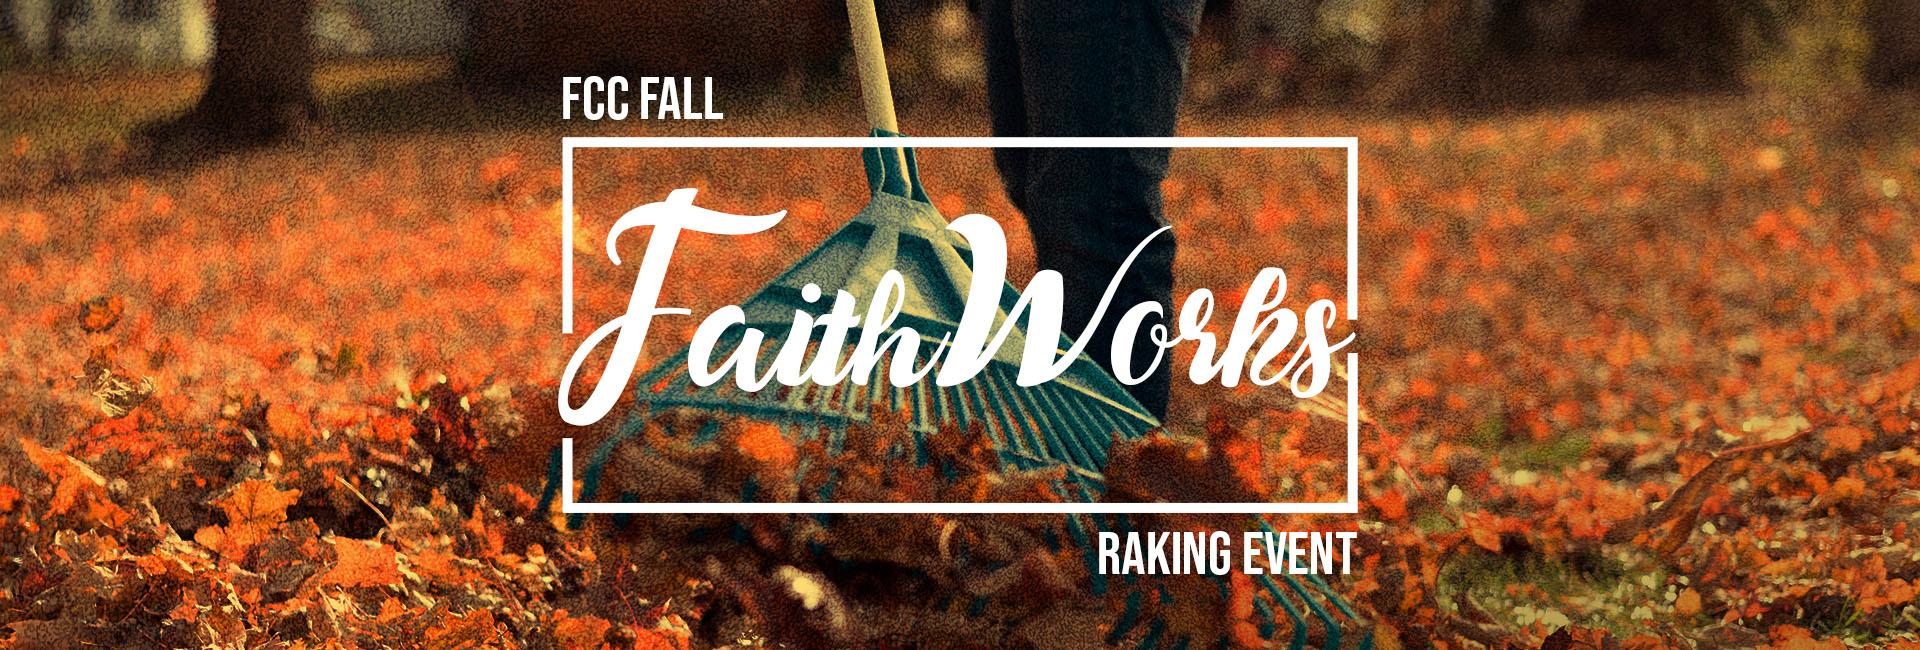 Fall FaithWorks Raking Event